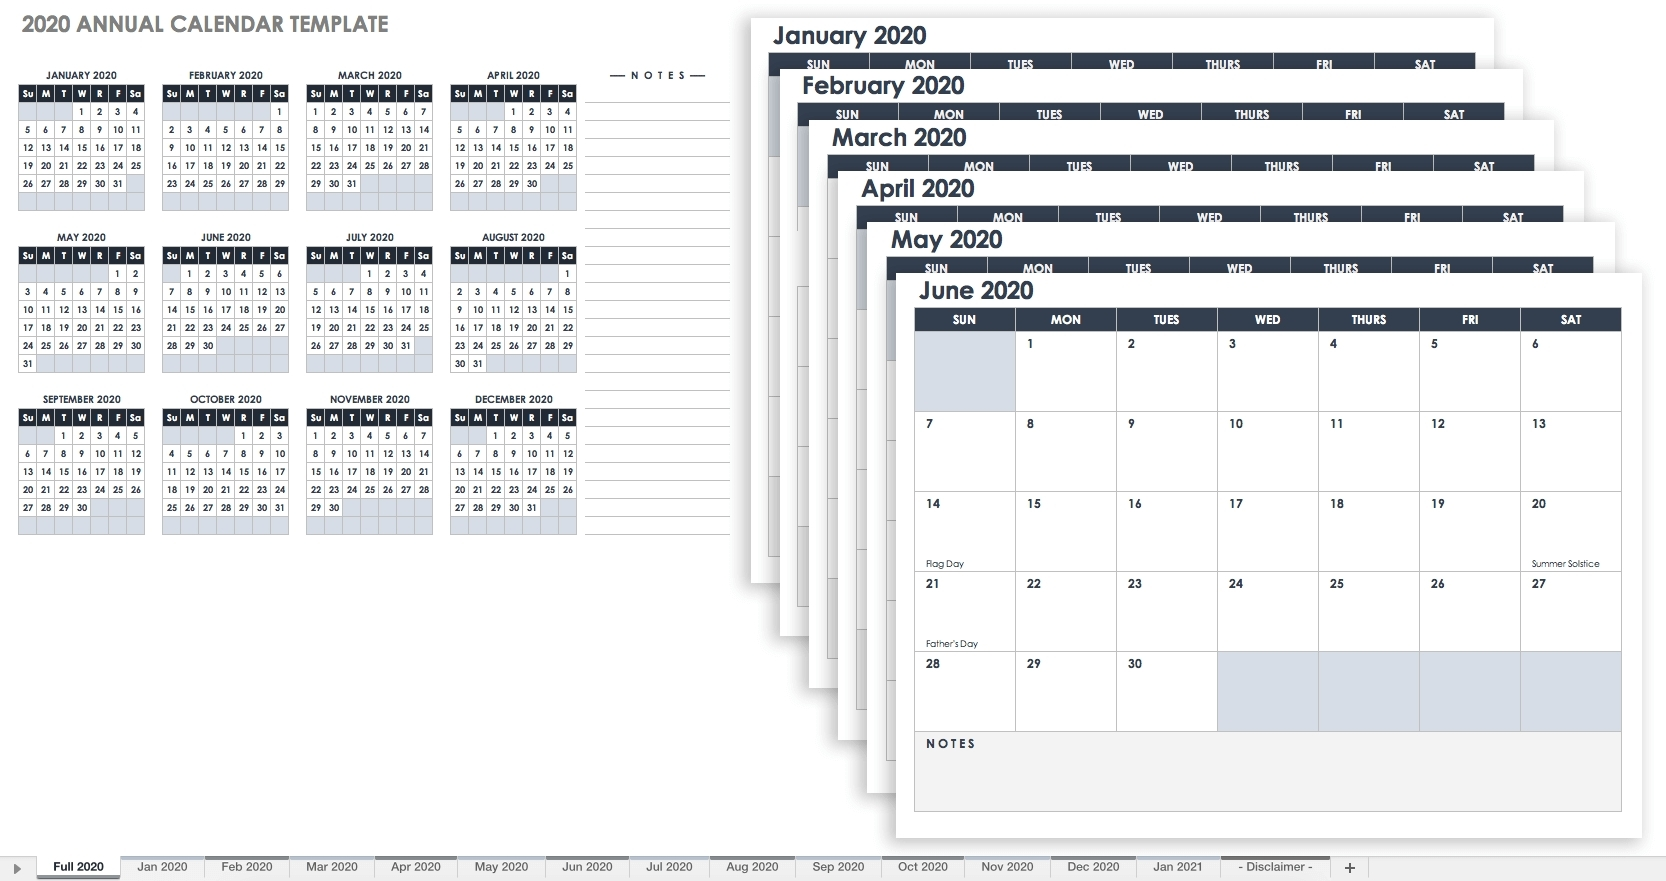 Calendar Week Date Excel | Igotlockedout